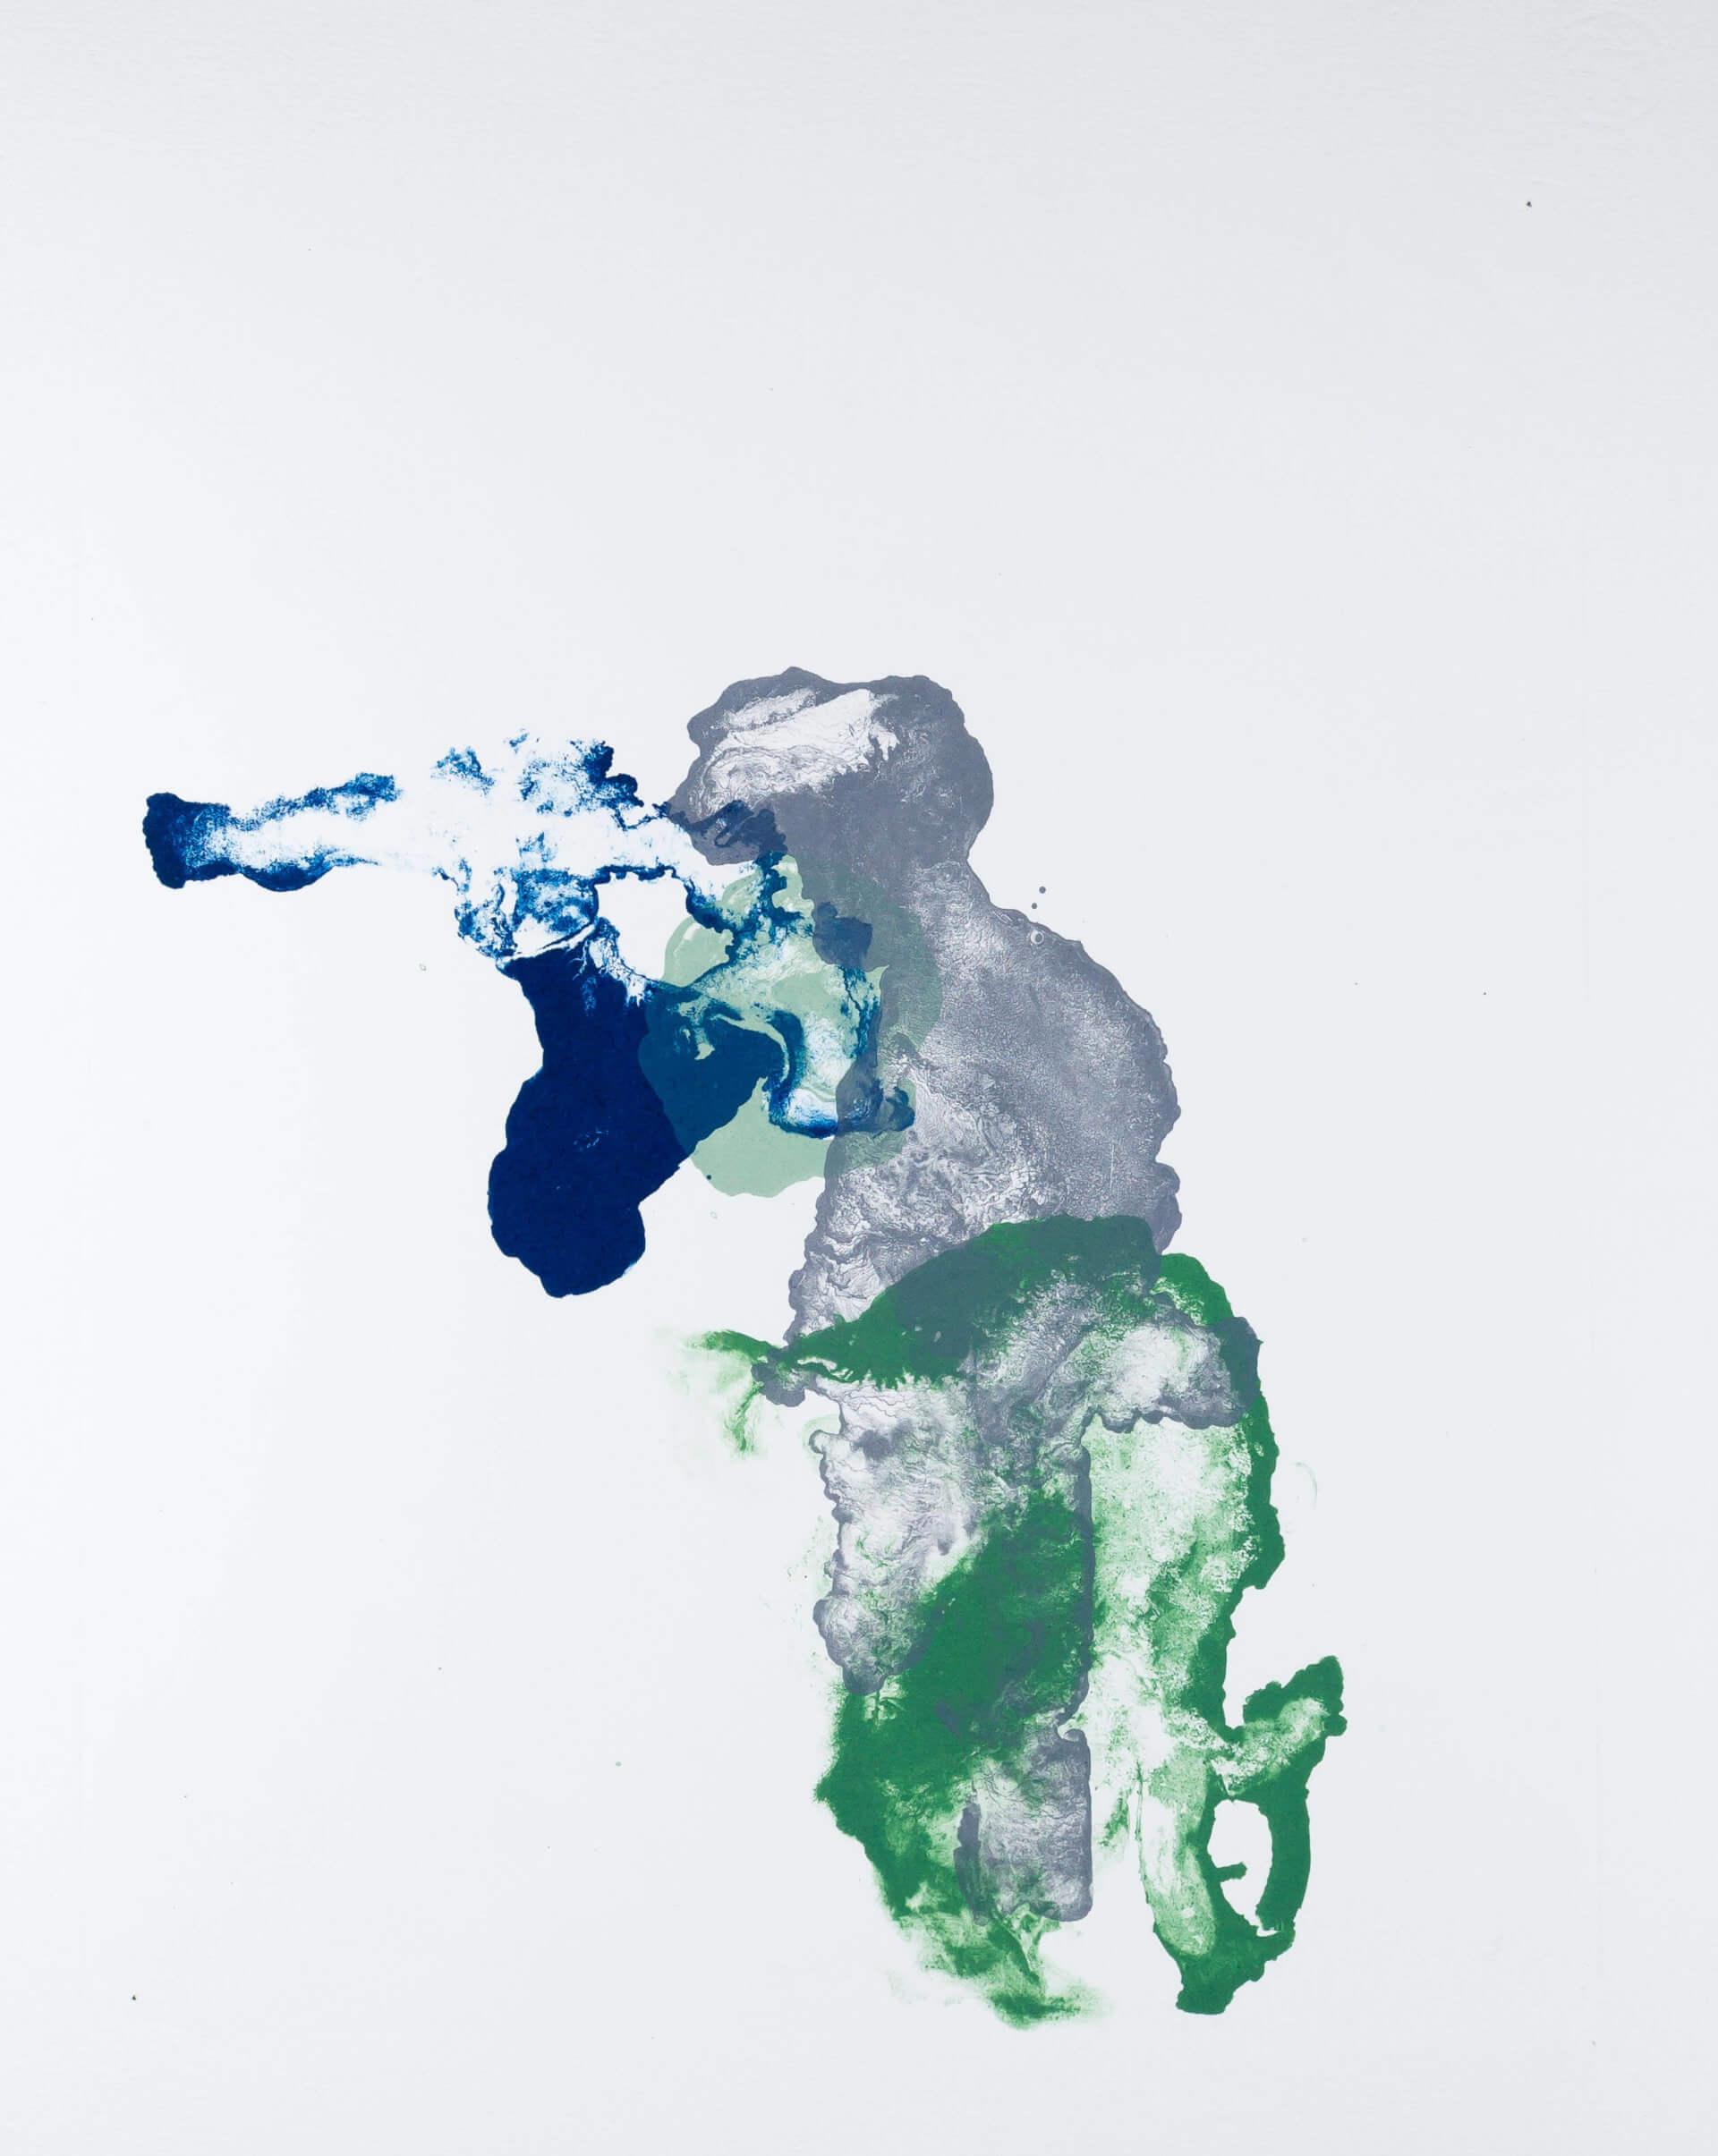 Katharina Albers, organism (growing)(D), 2017, Farblithographie, Unikat, 56x45 cm